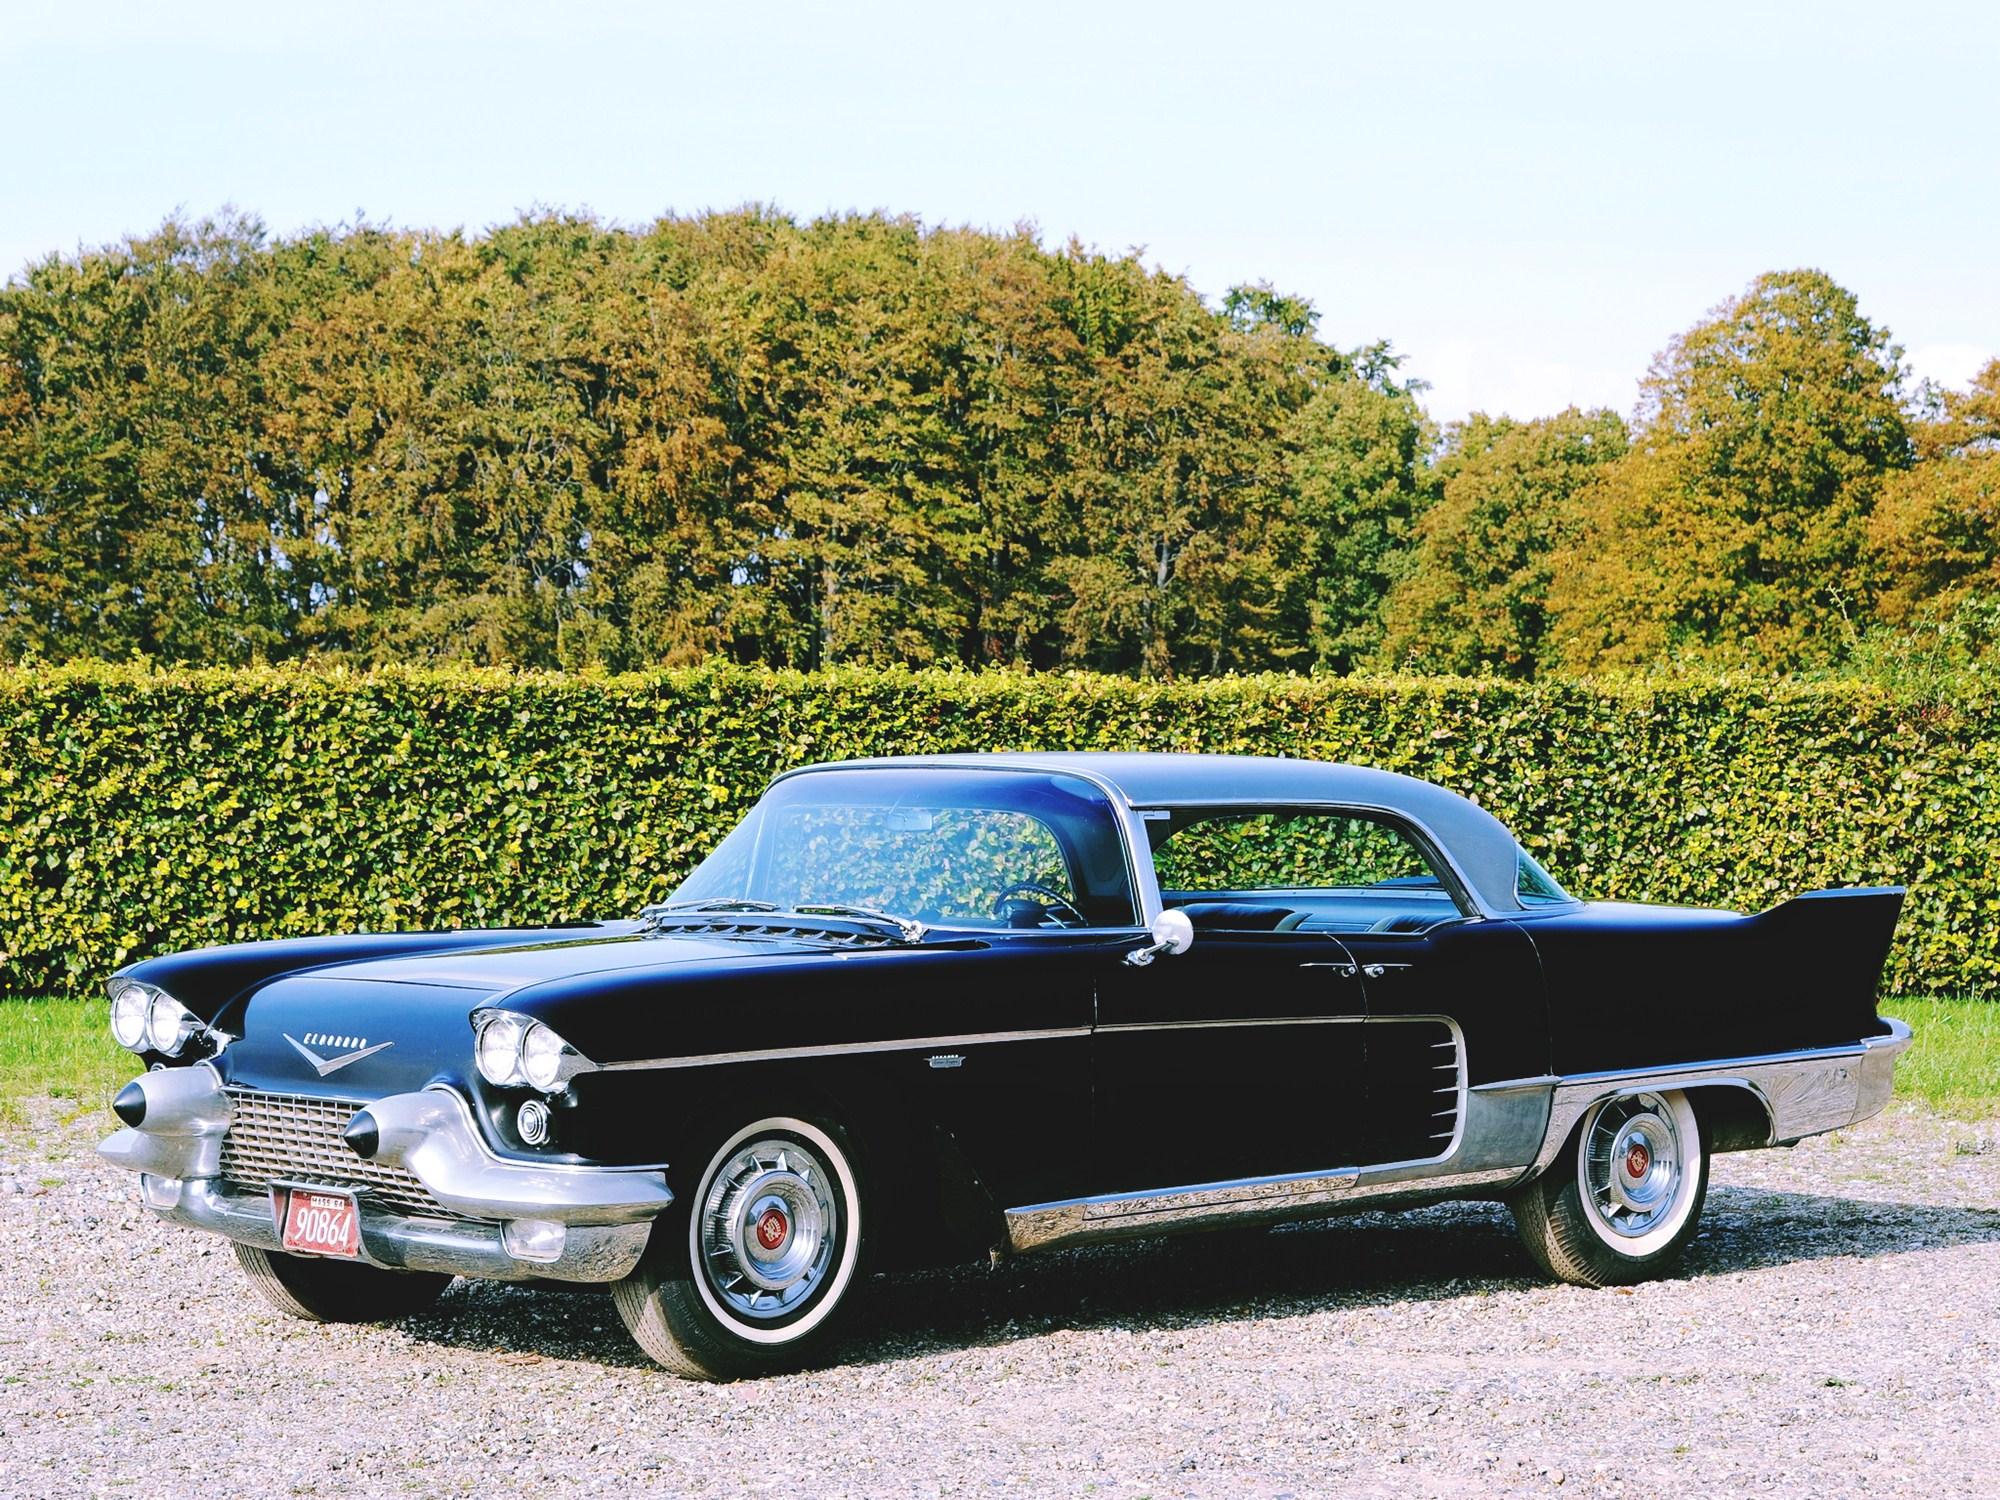 High Resolution Wallpaper | 1958 Cadillac Eldorado Brougham 2000x1500 px